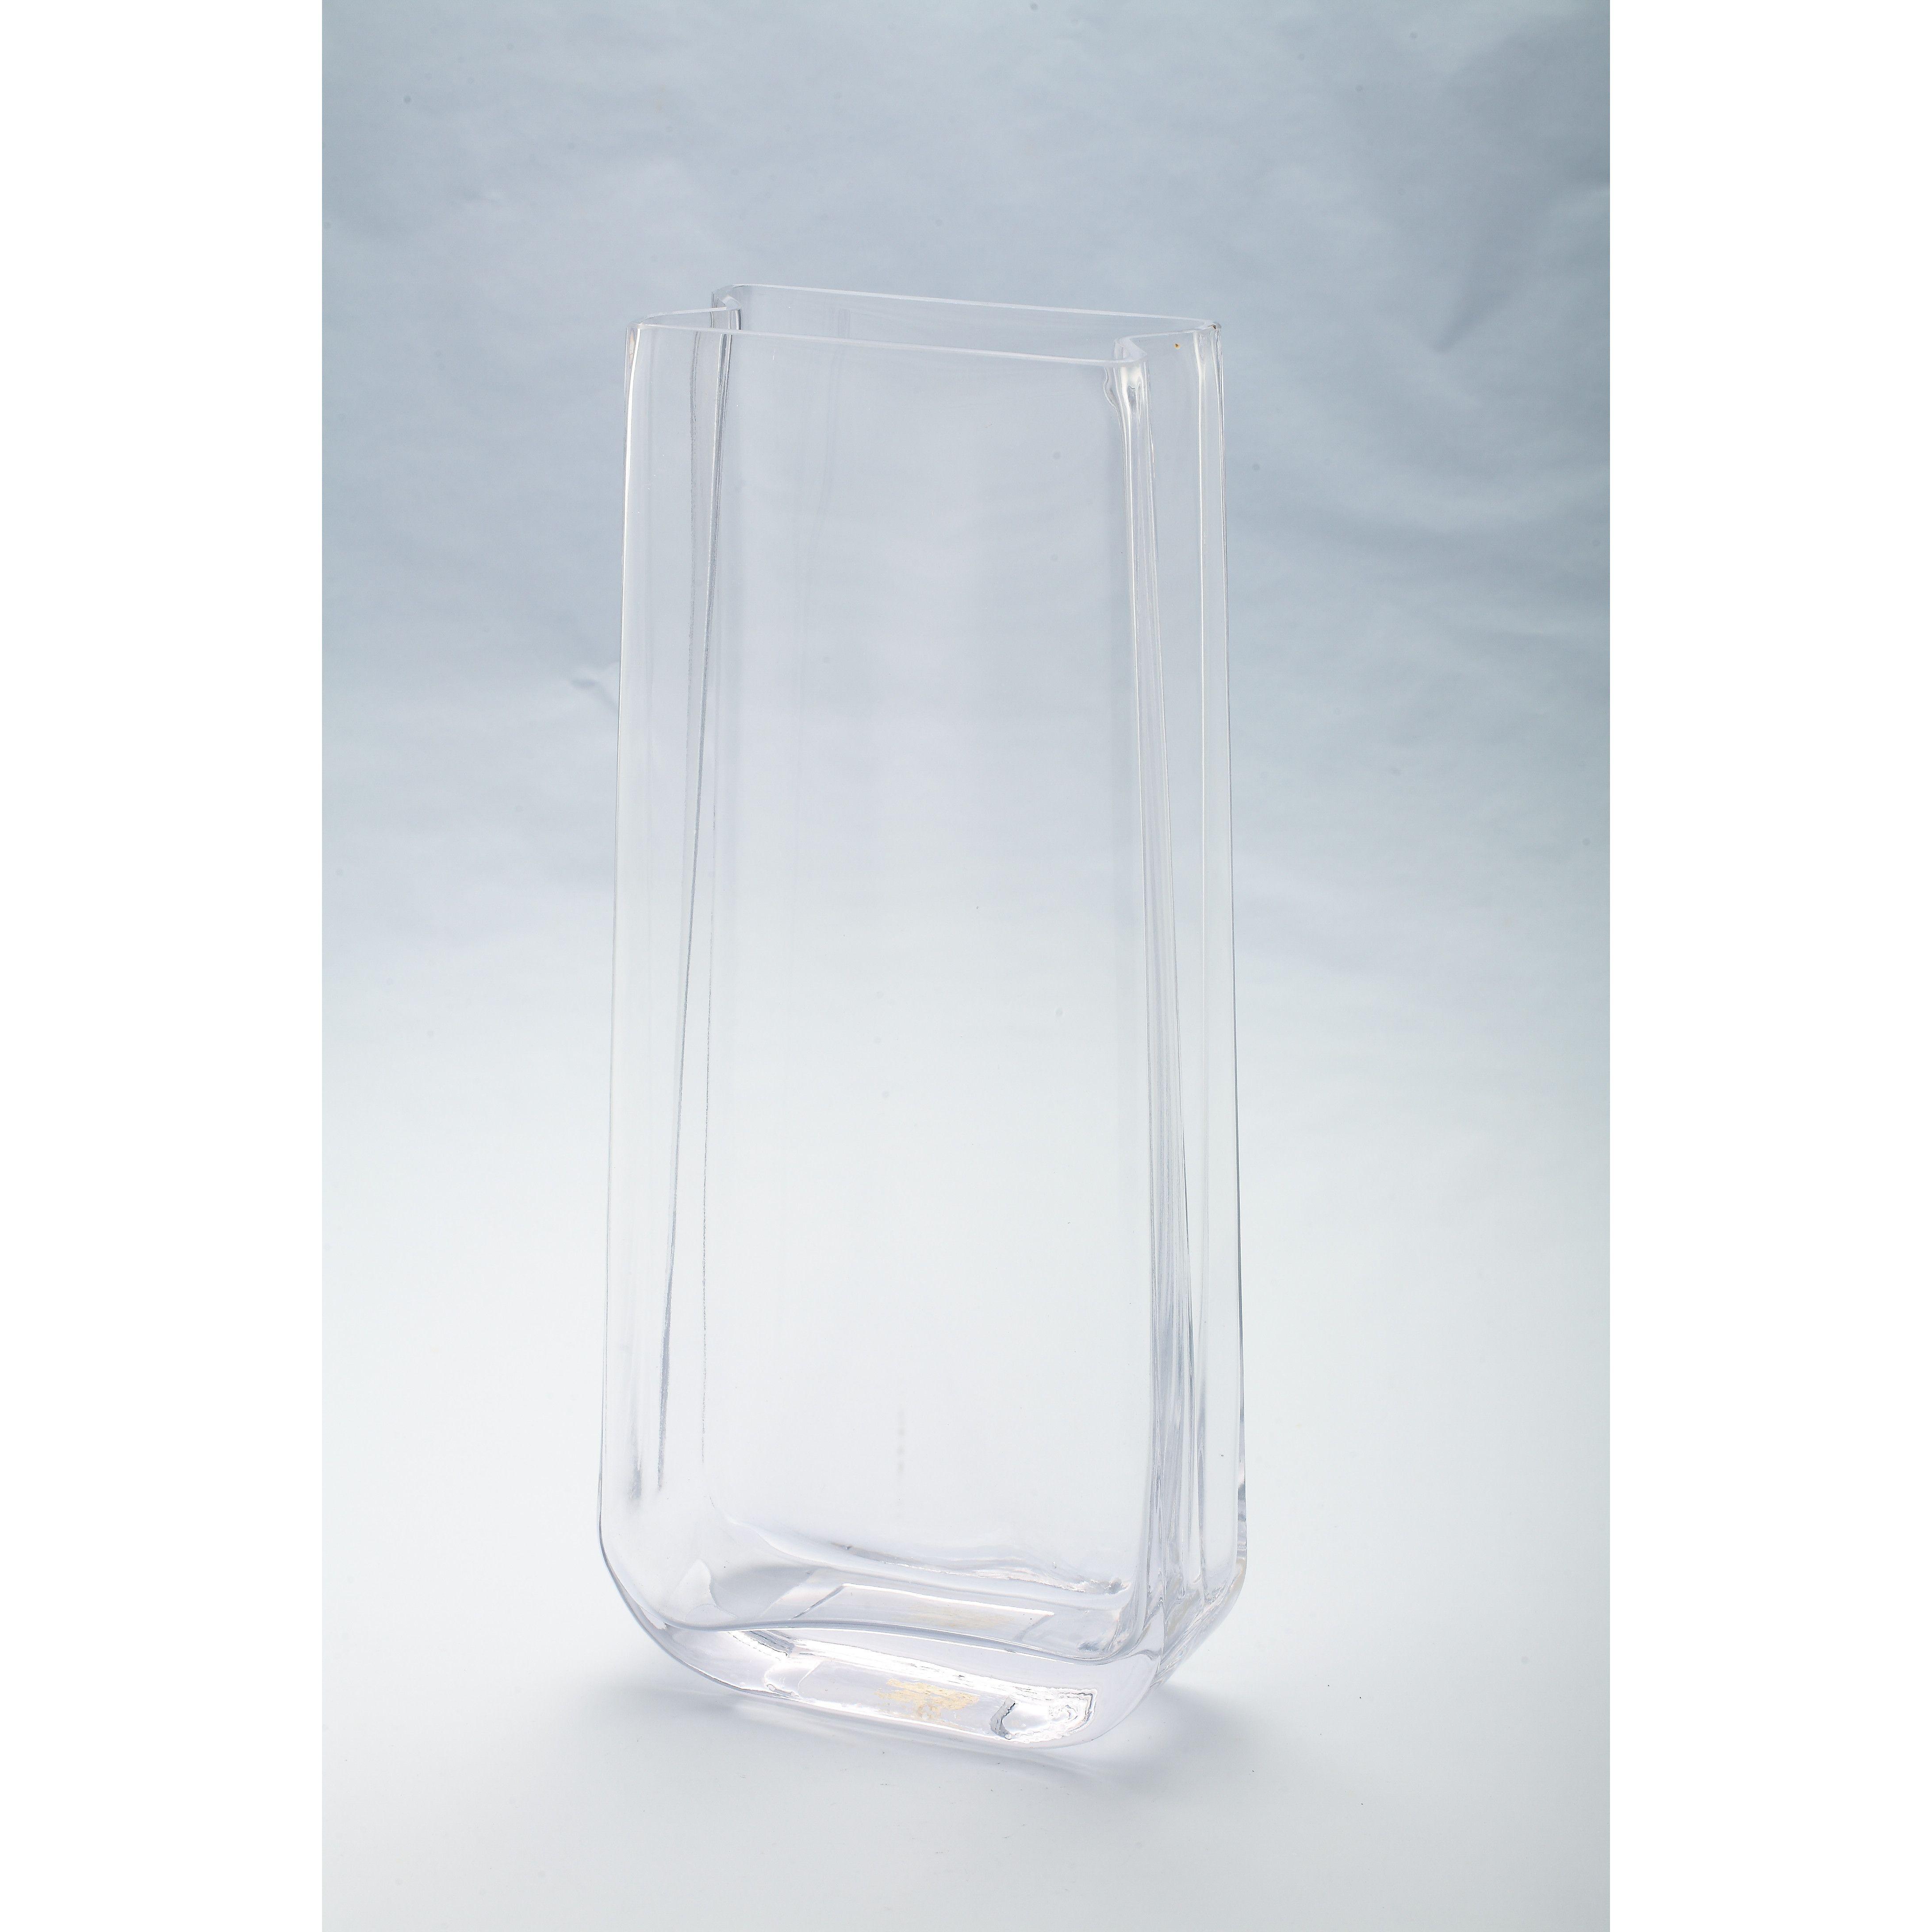 big champagne glass vase of rent glass vases image diamond star glass vase wedding rental ideas in diamond star glass vase wedding rental ideas pinterest